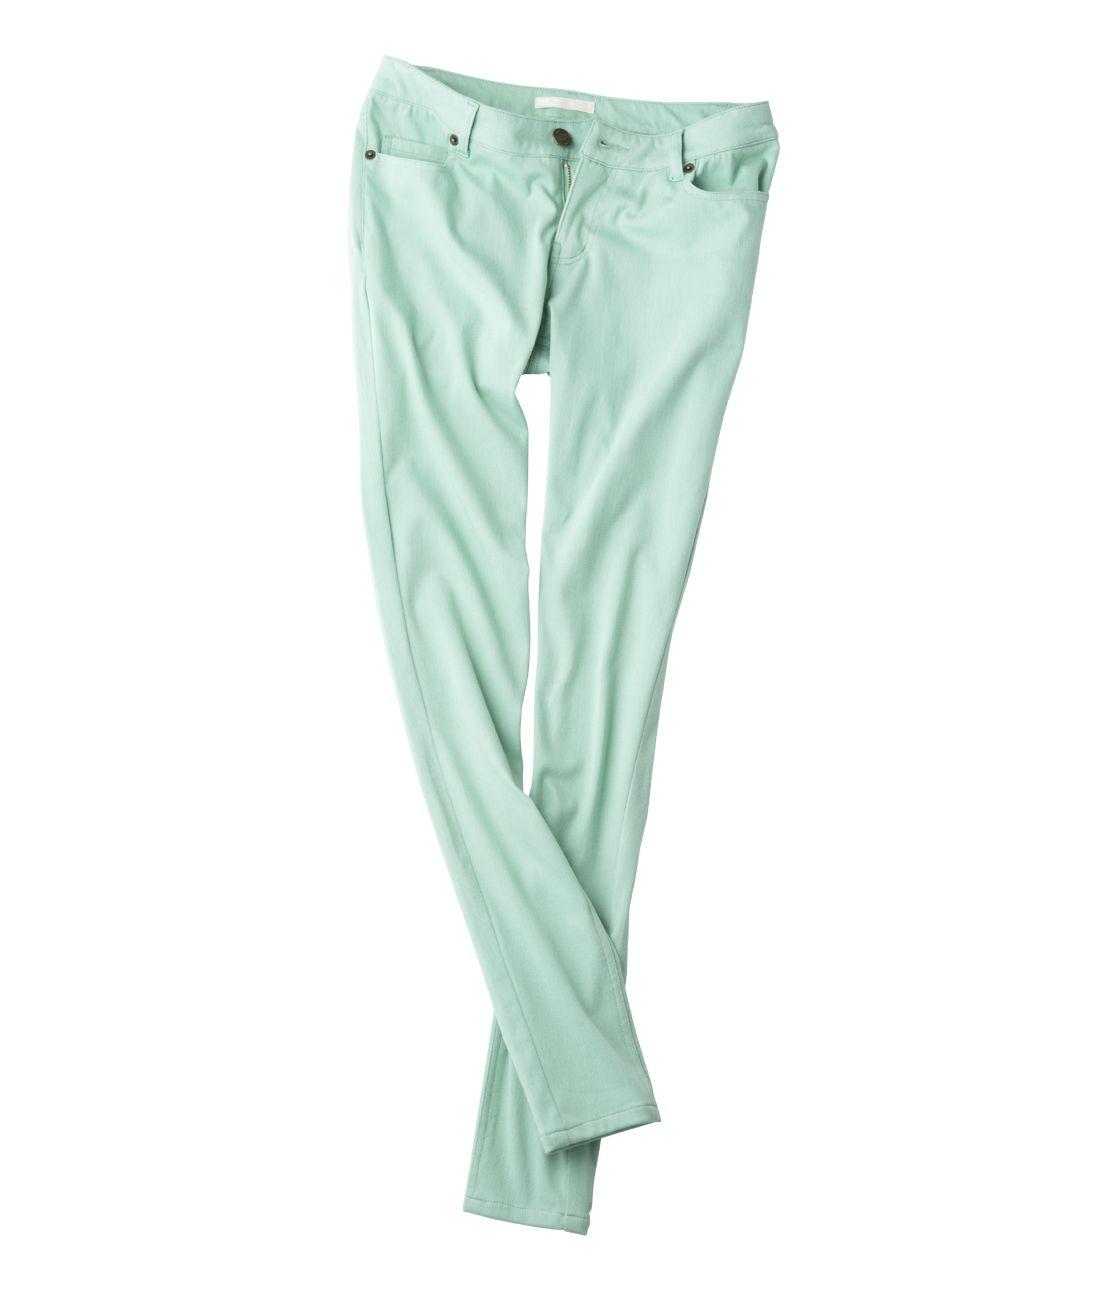 KULISH jade pants